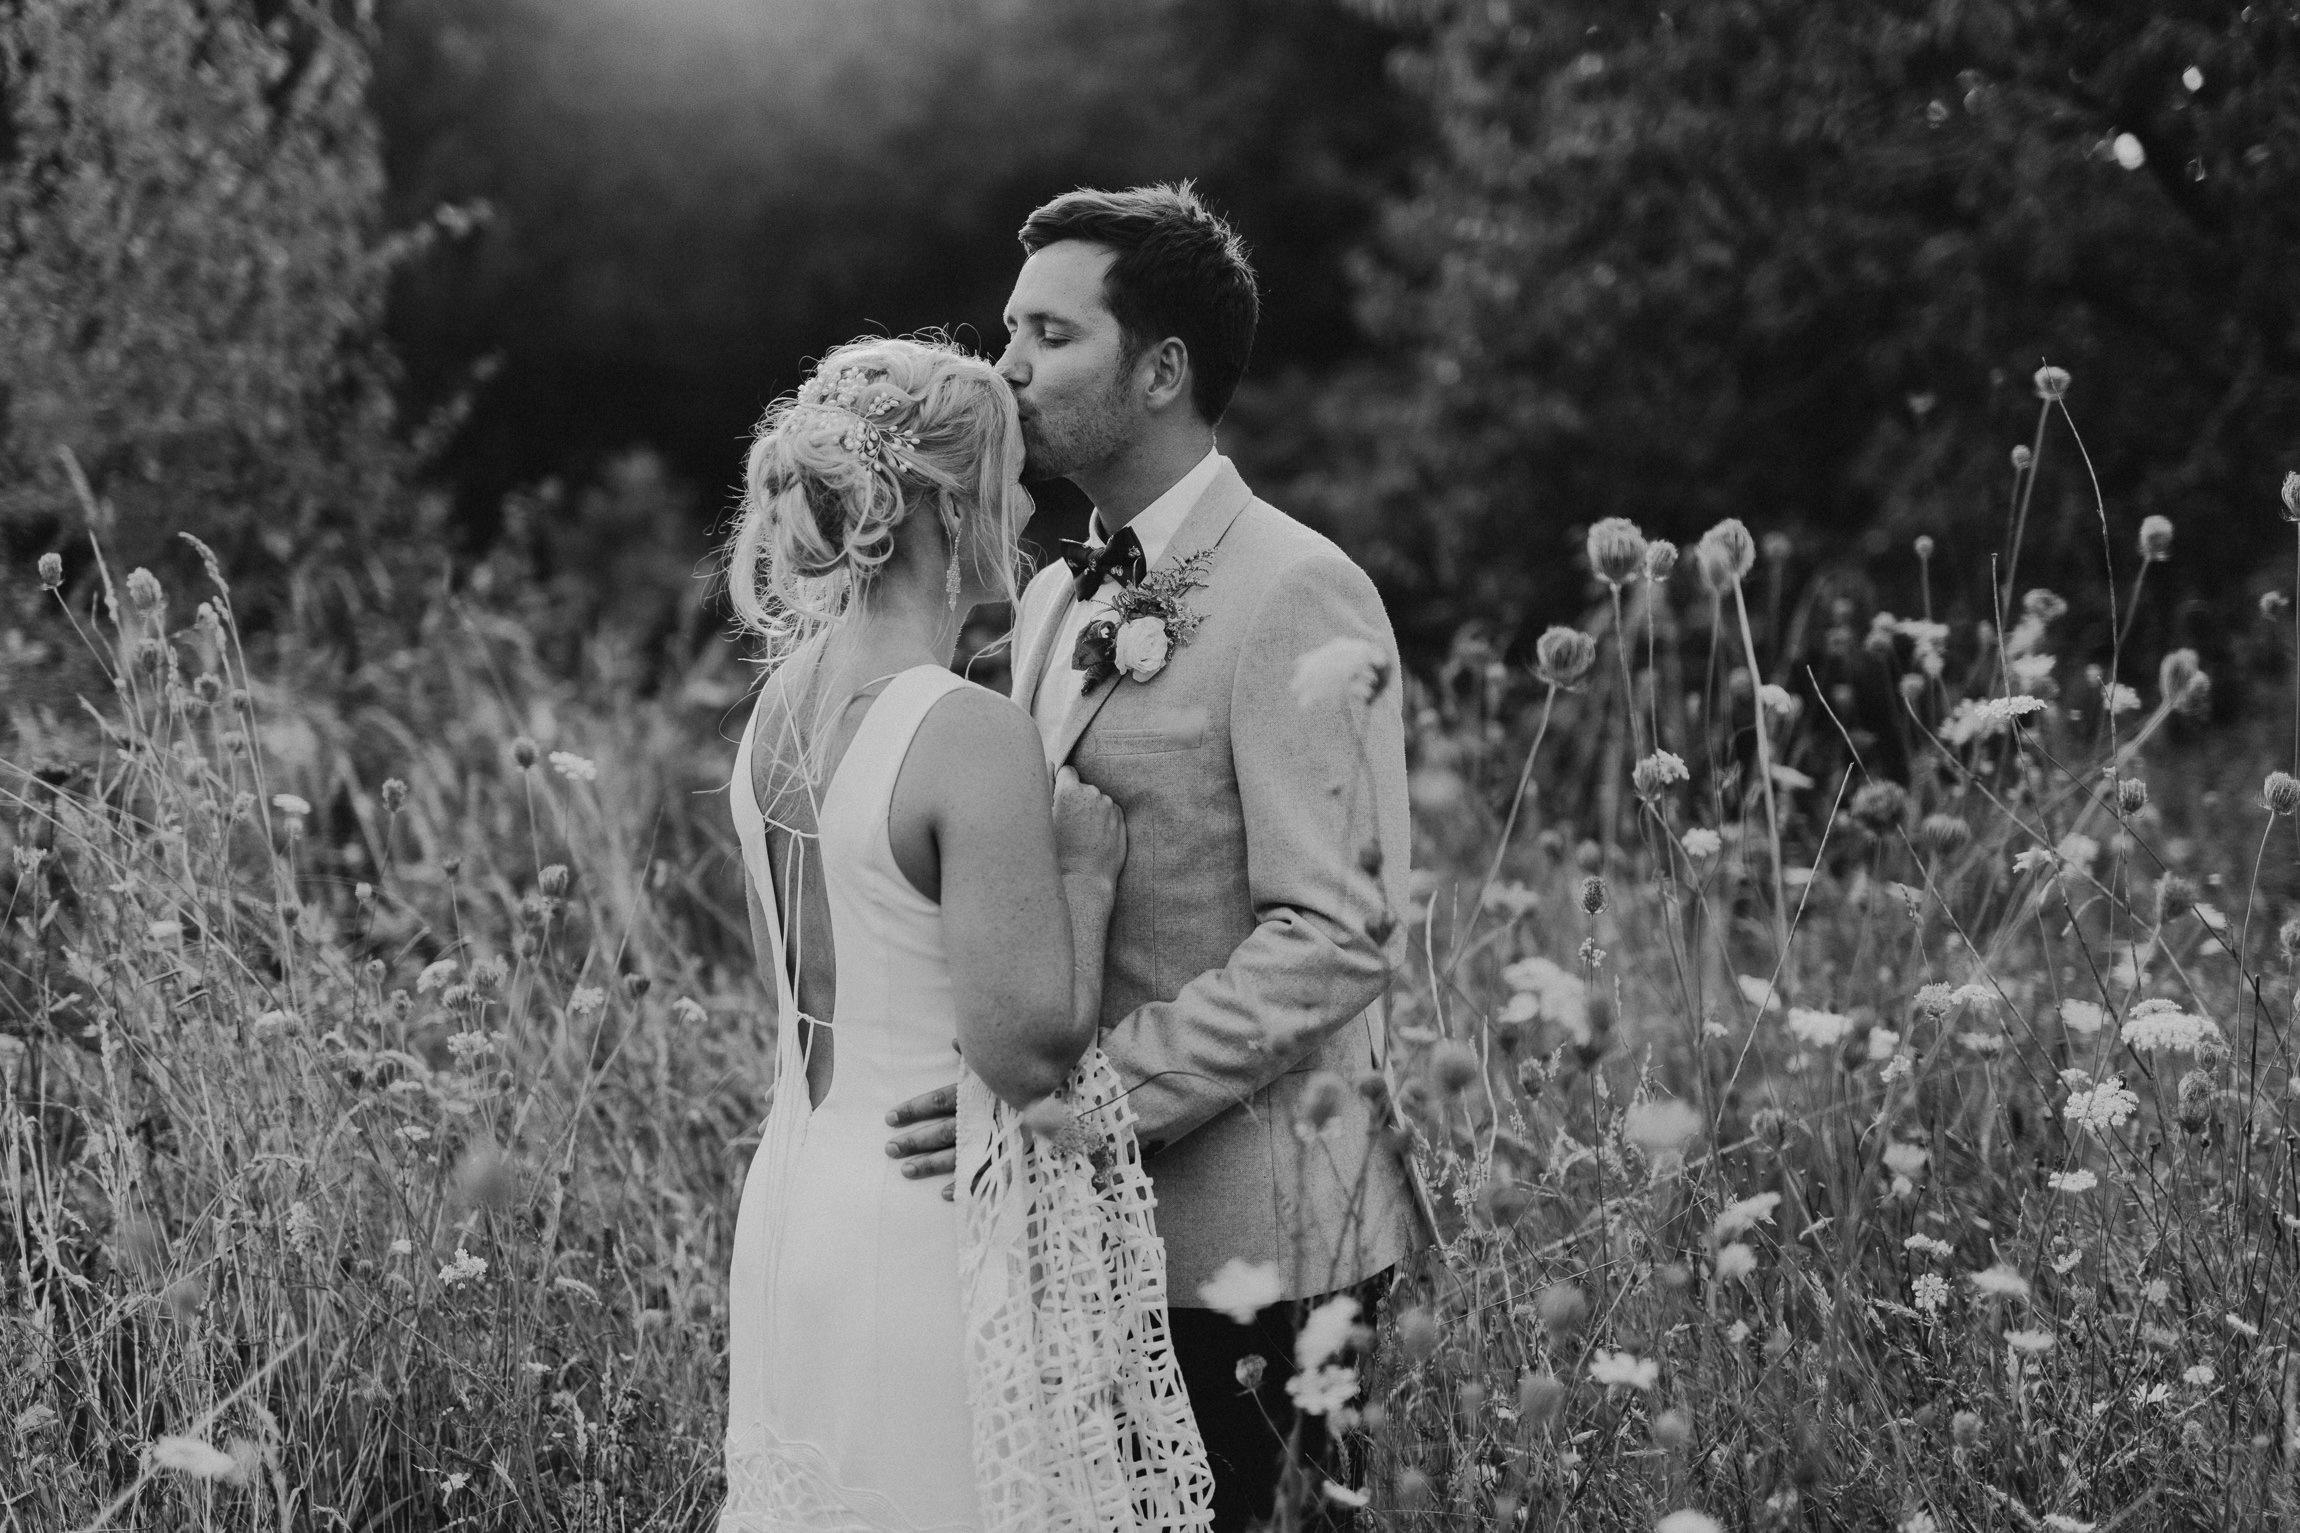 oldforestschool-wedding-blog-164.jpg